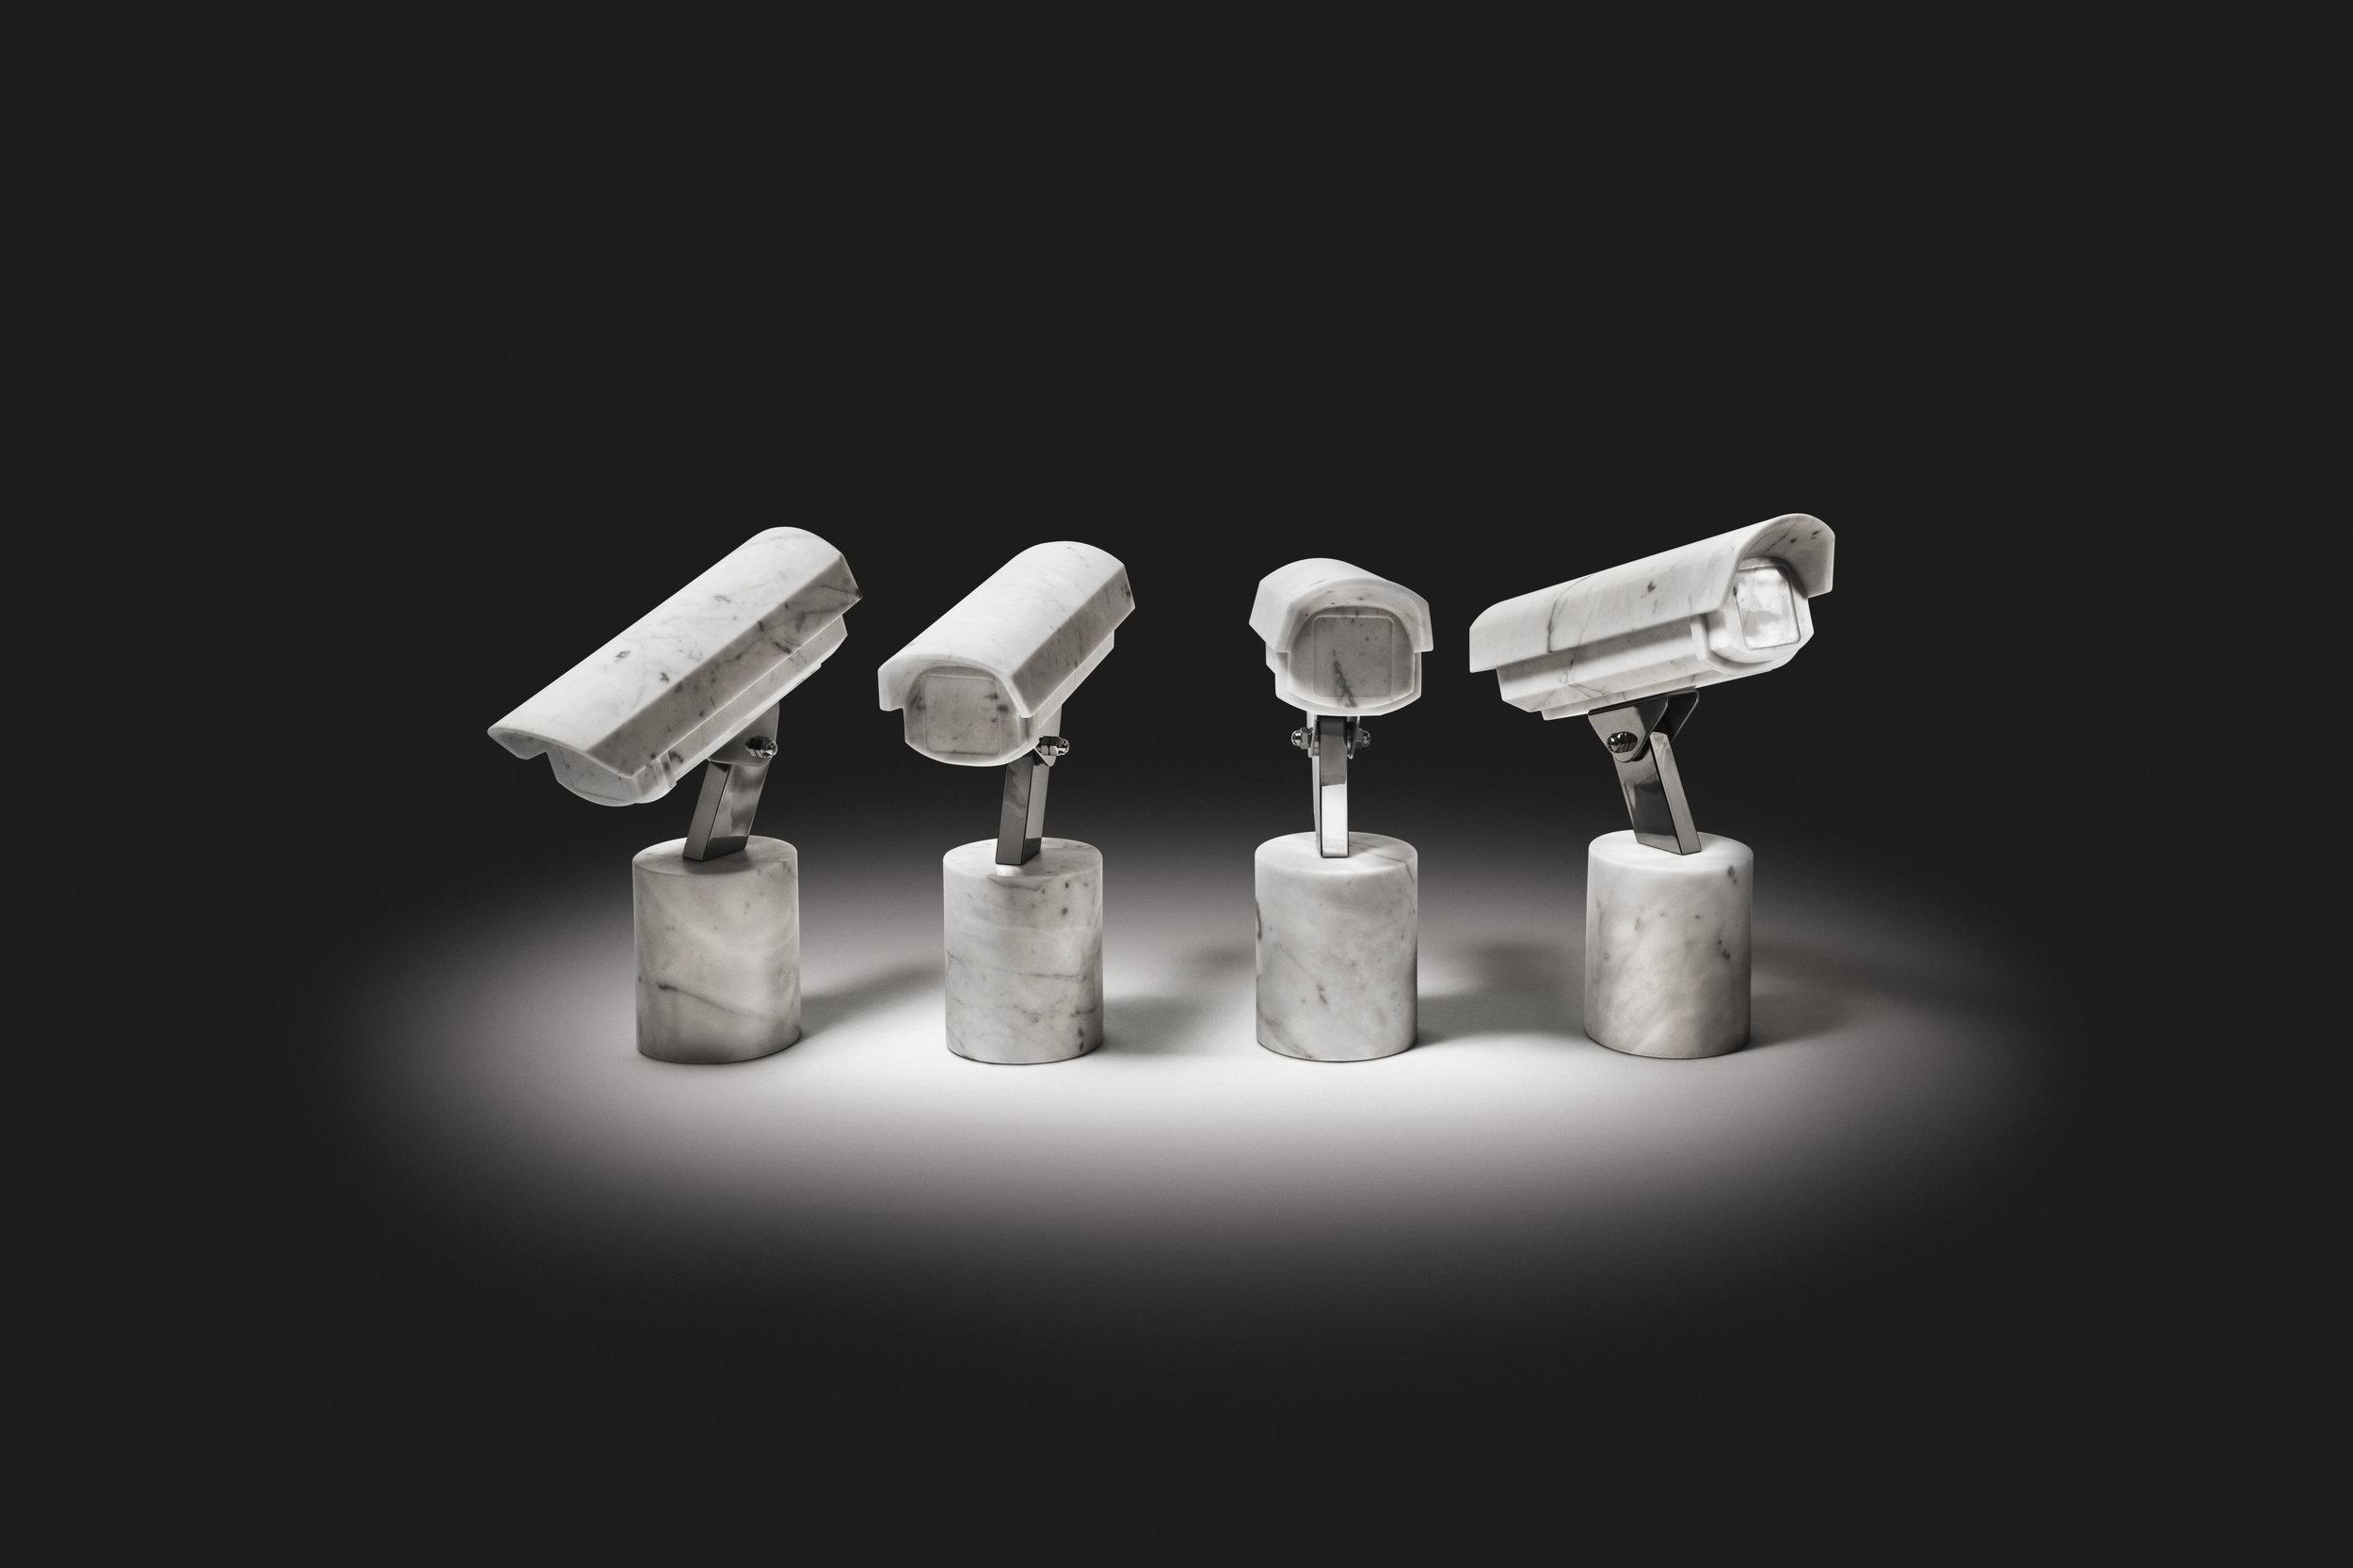 Quartet   2012 Bianco Carrara marble, stainless steel 4 pieces,46 x 15 x 35 cm each